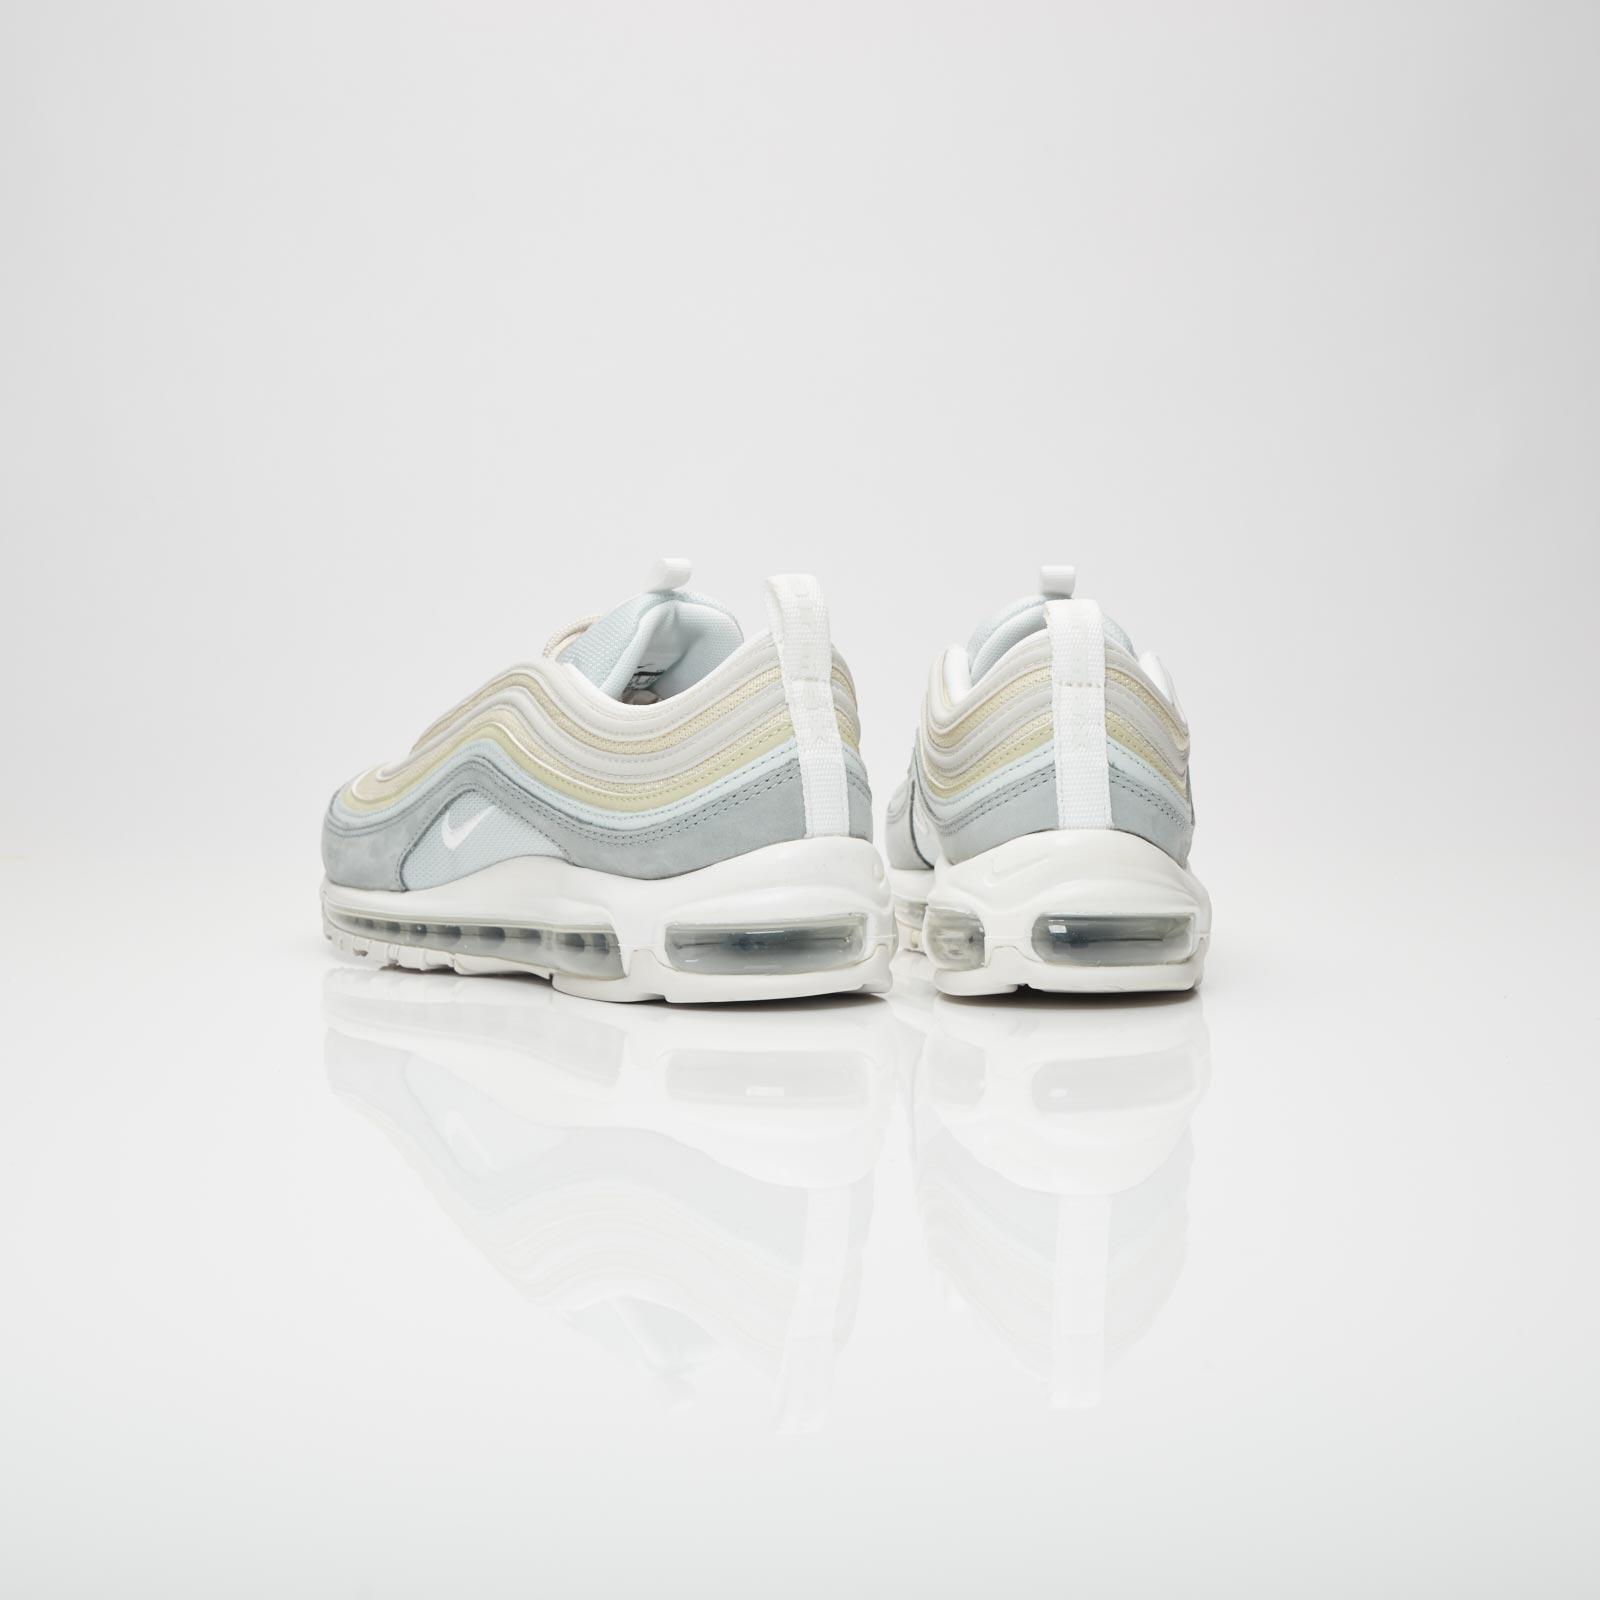 8e3517d929 Nike Air Max 97 Premium - 312834-004 - Sneakersnstuff   sneakers &  streetwear online since 1999